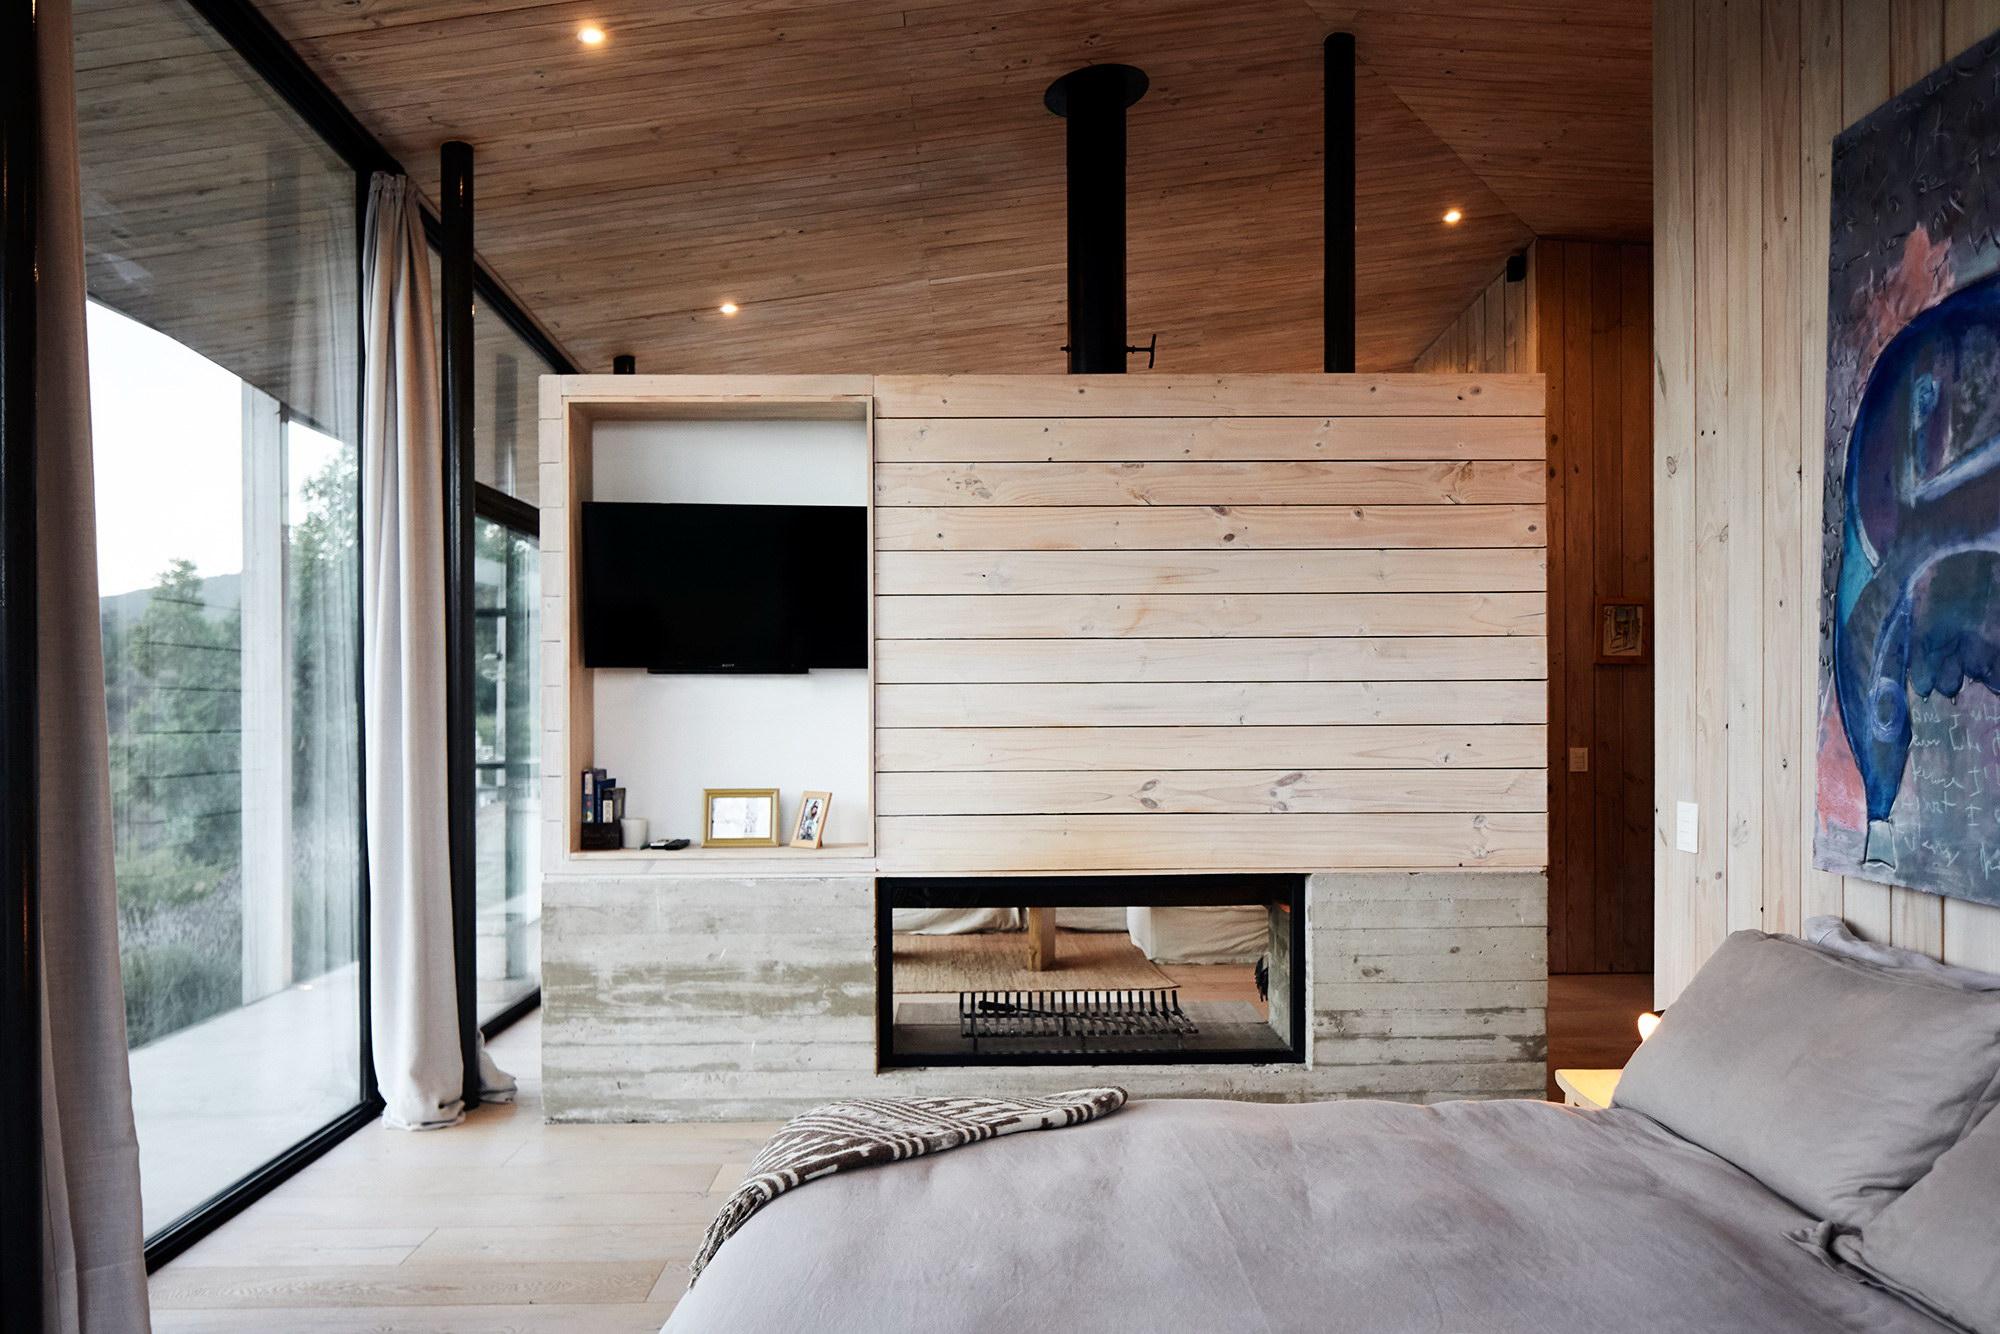 House 14 by Alvano y Riquelme Architects